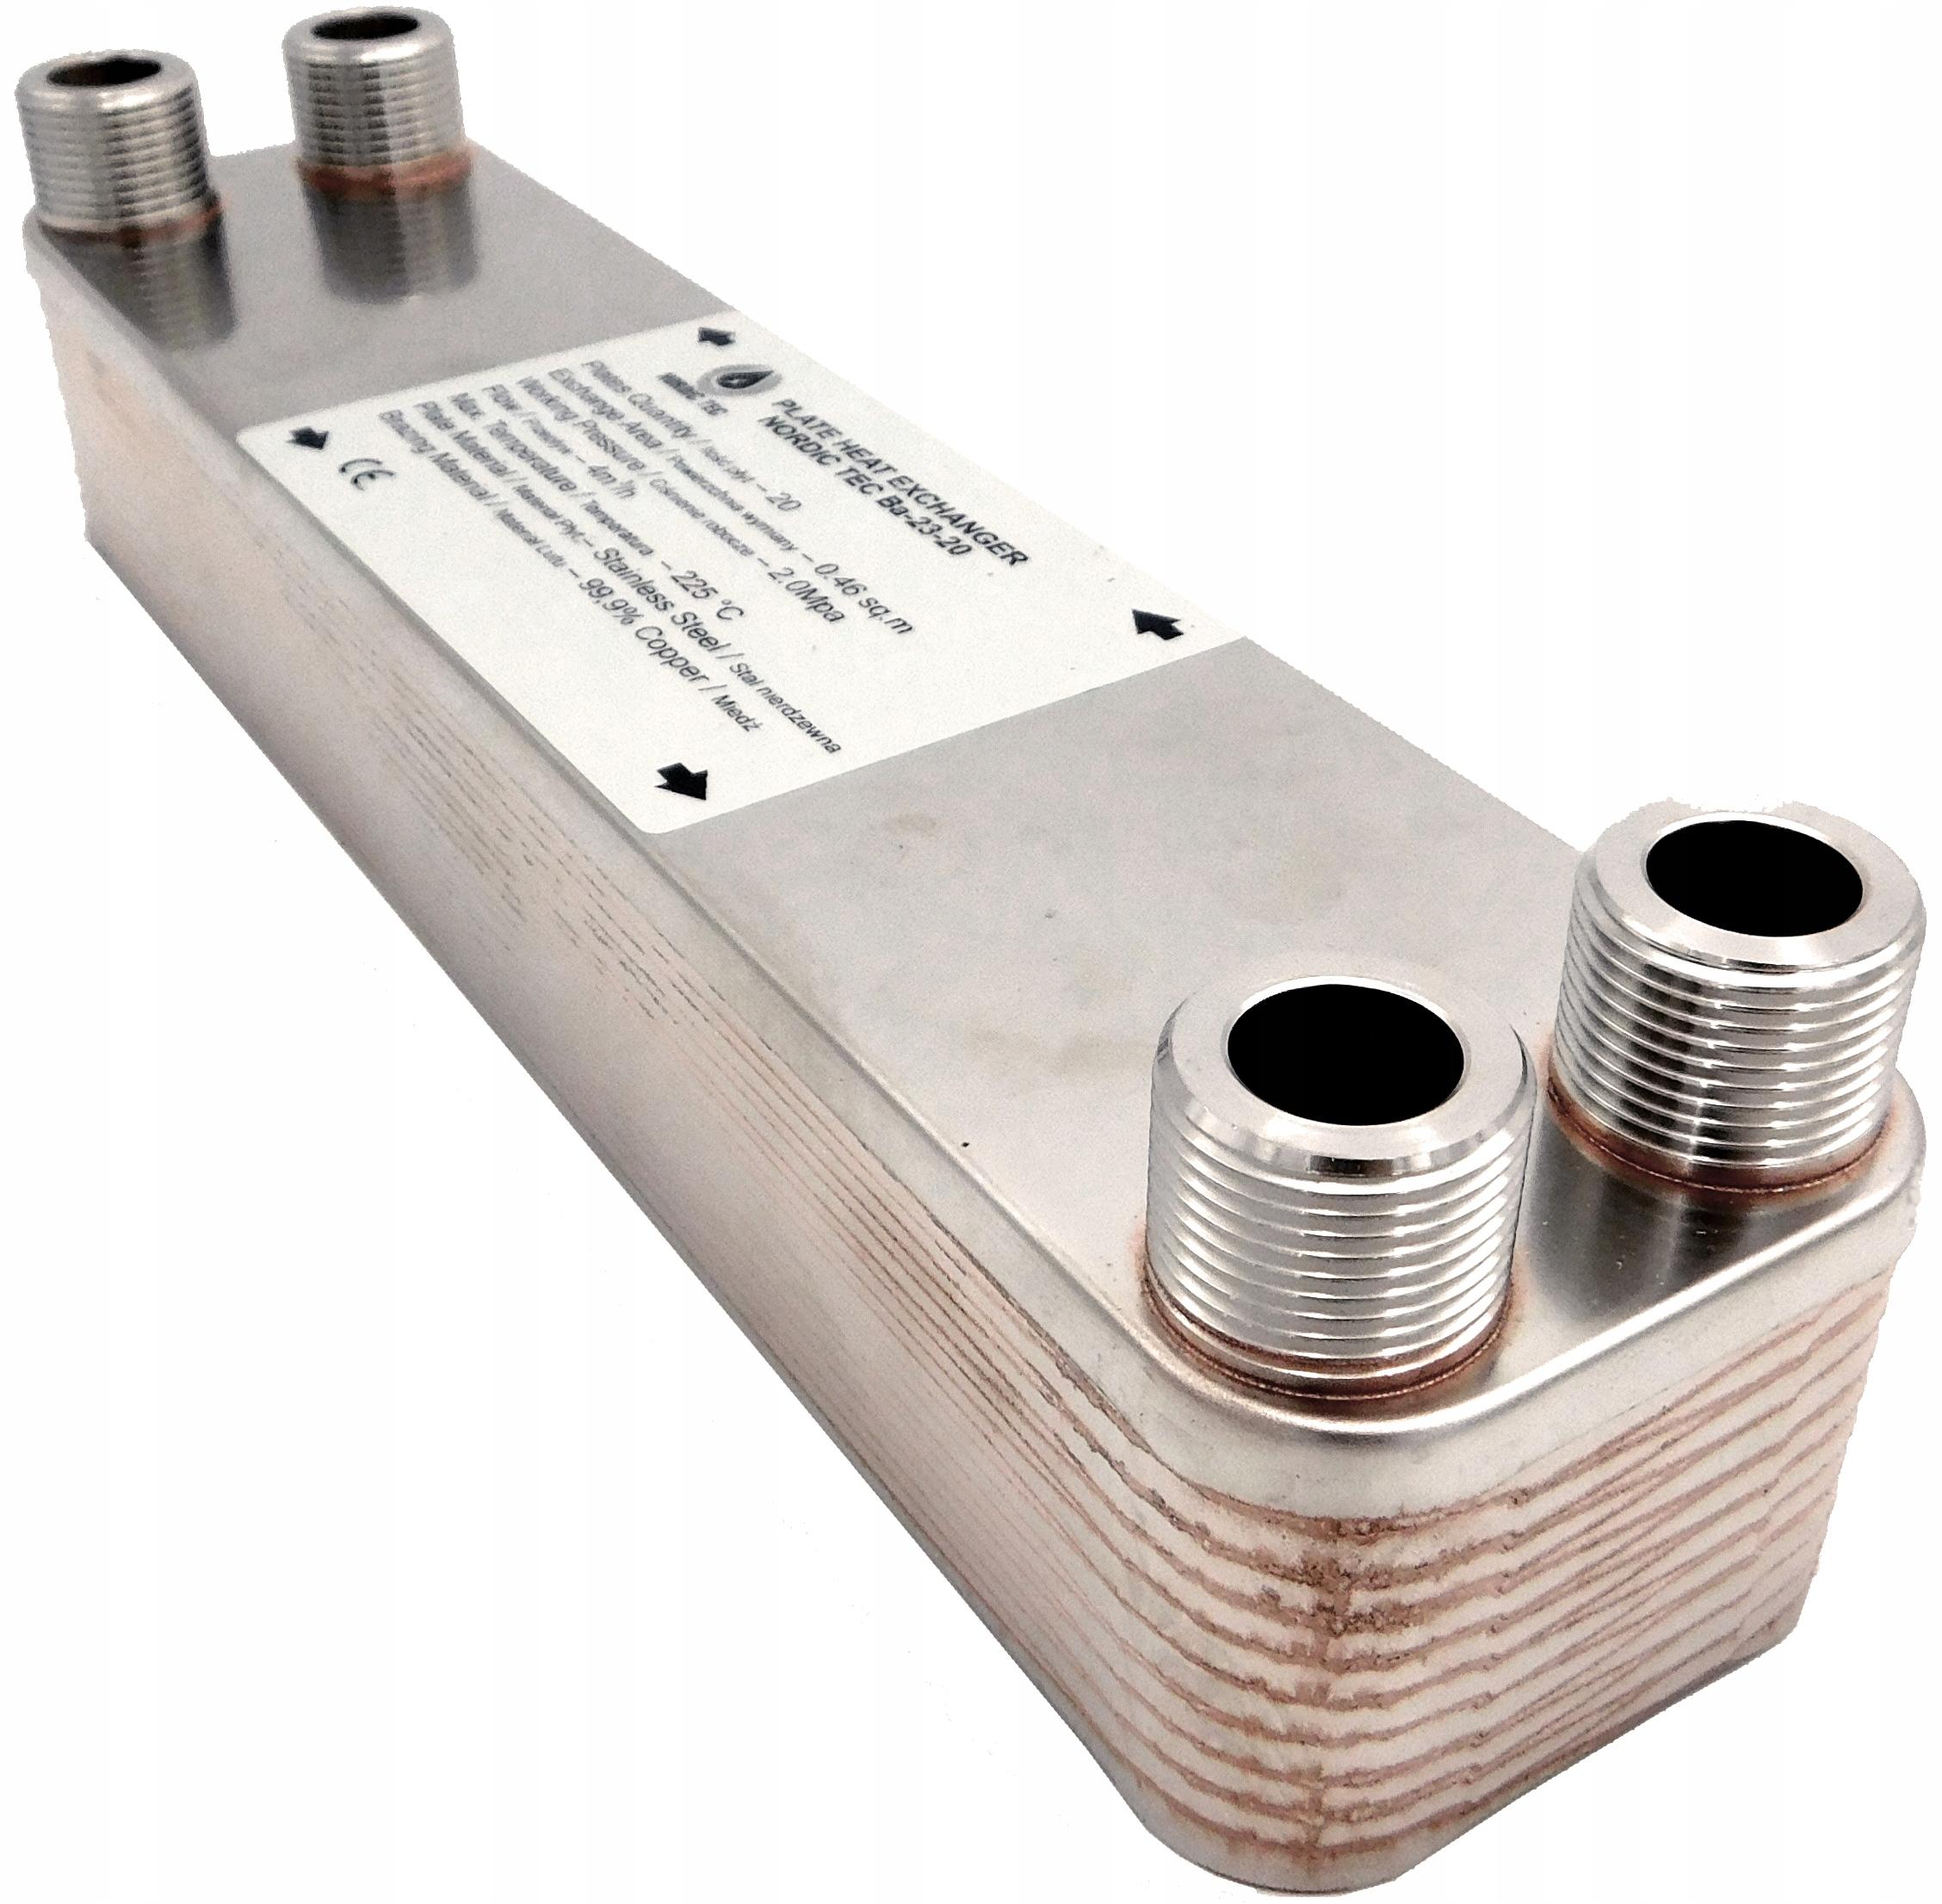 Теплообменник 25 кВт, 20 пластин 3/4 'NORDIC Tec